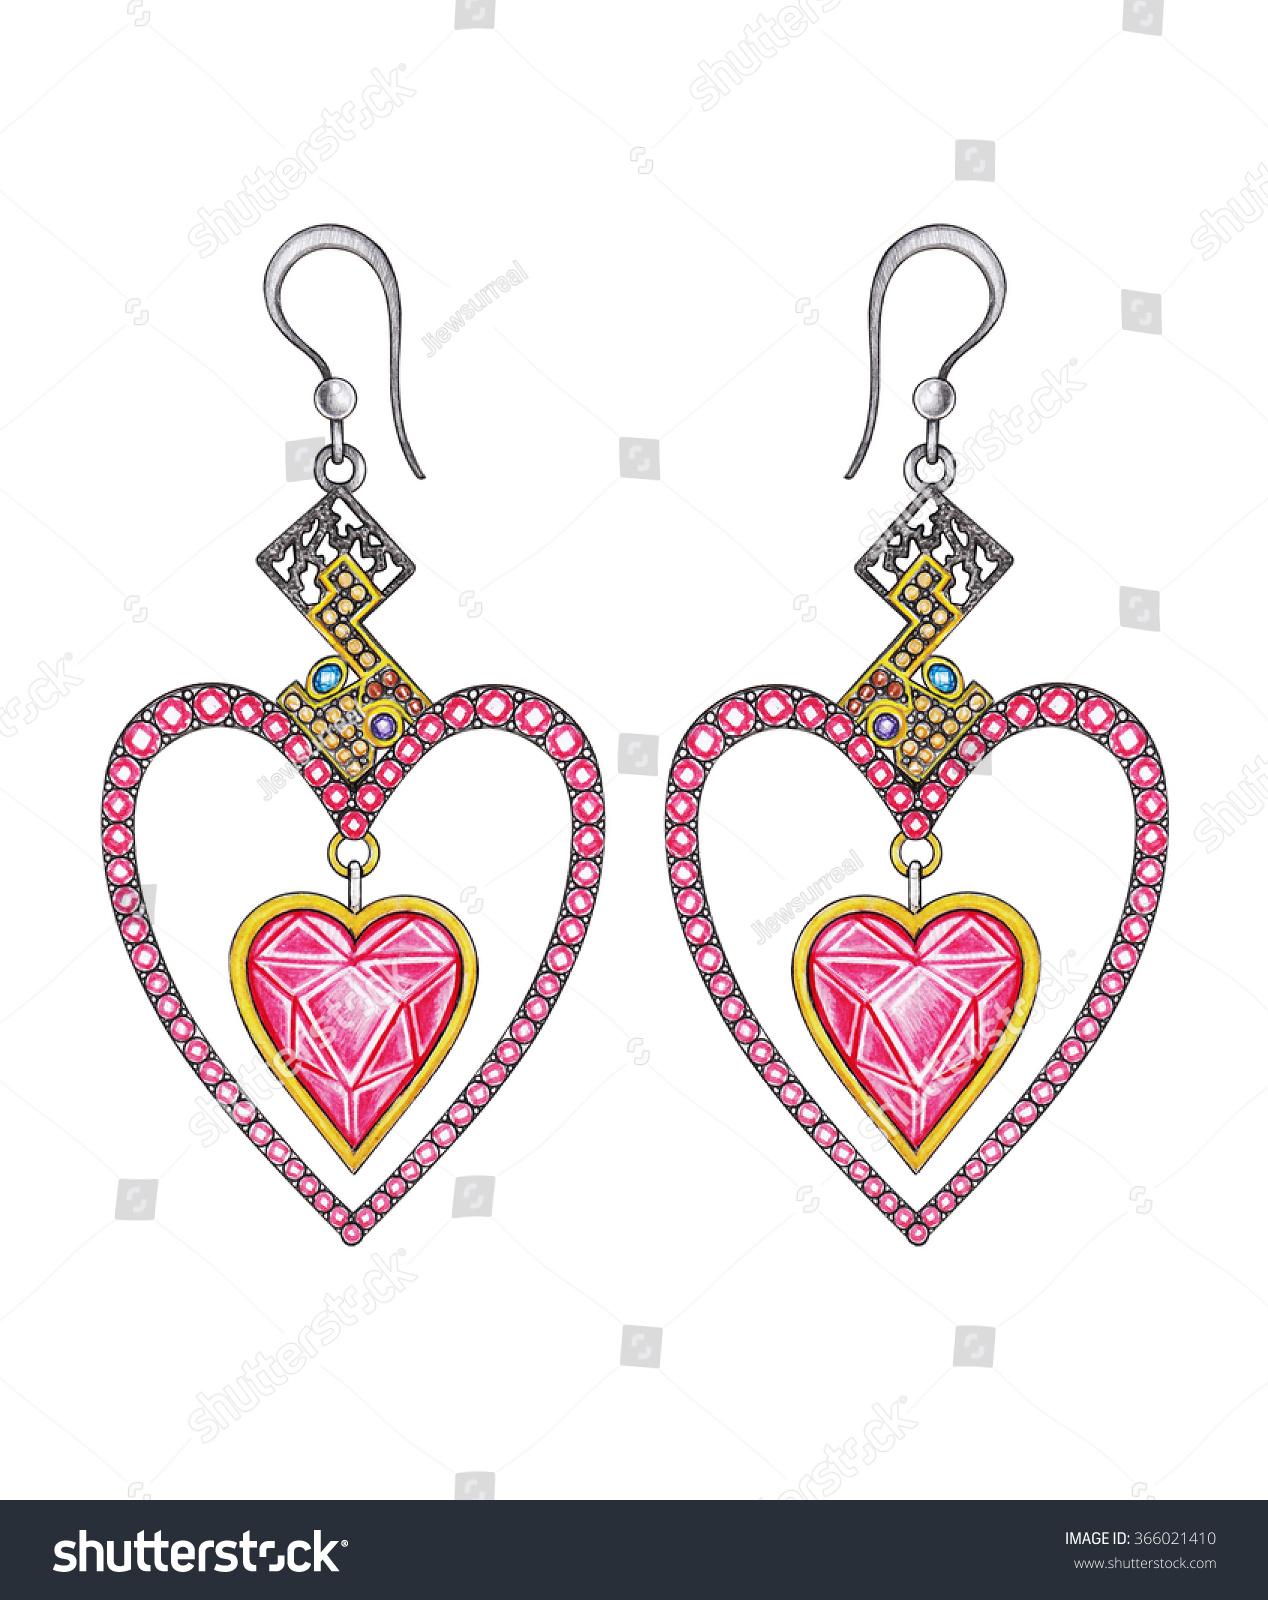 Jewelry Design Heart Earrings Hand Pencil Stock Illustration